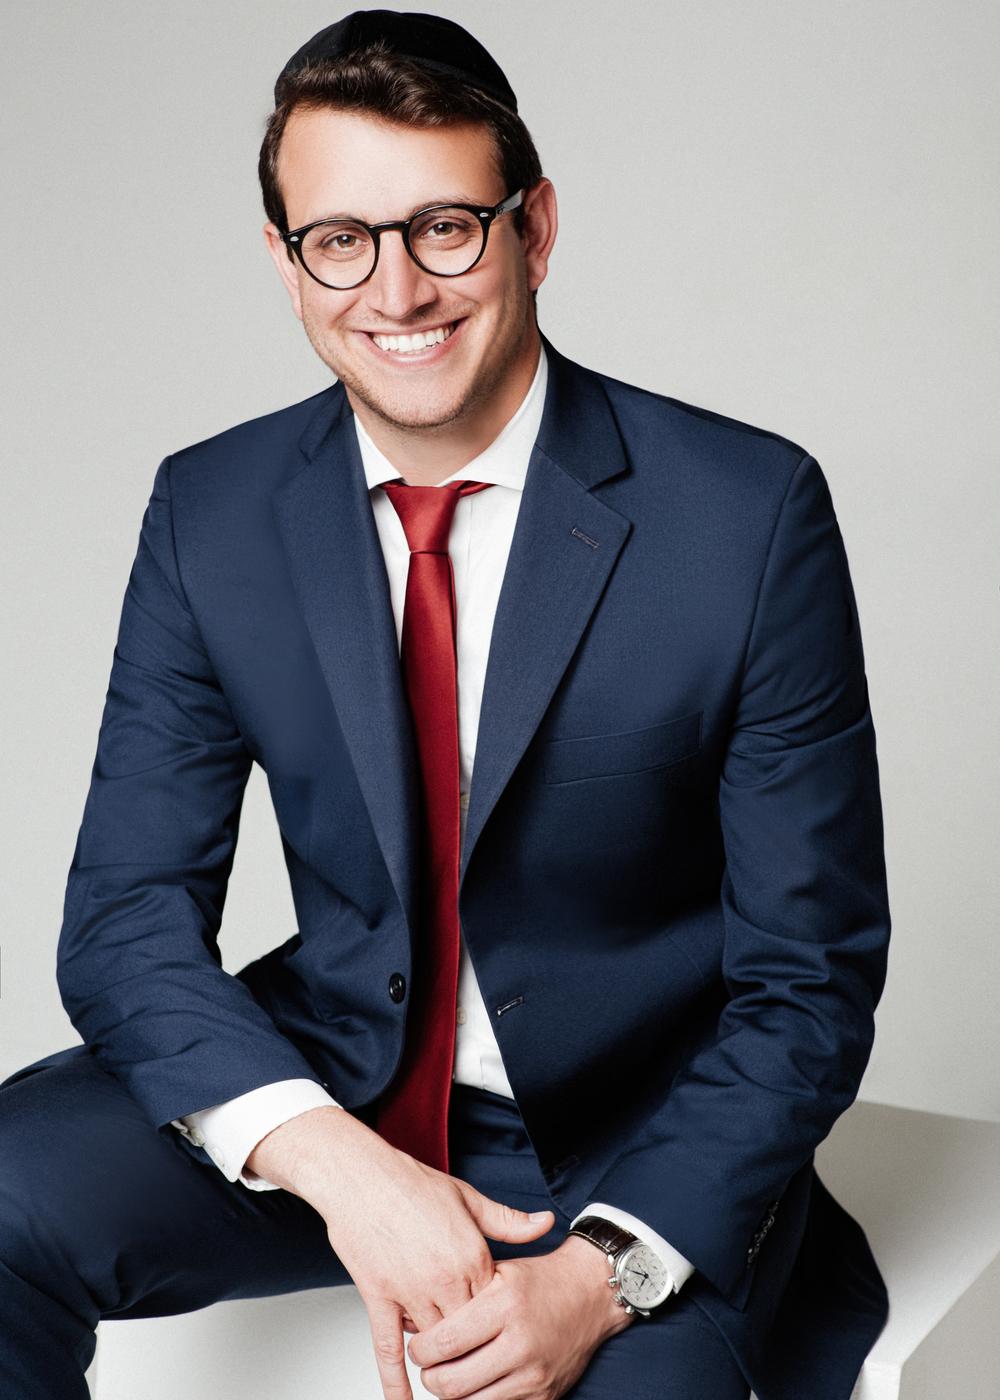 CEO-portrait-corporate-headshot-14.jpg